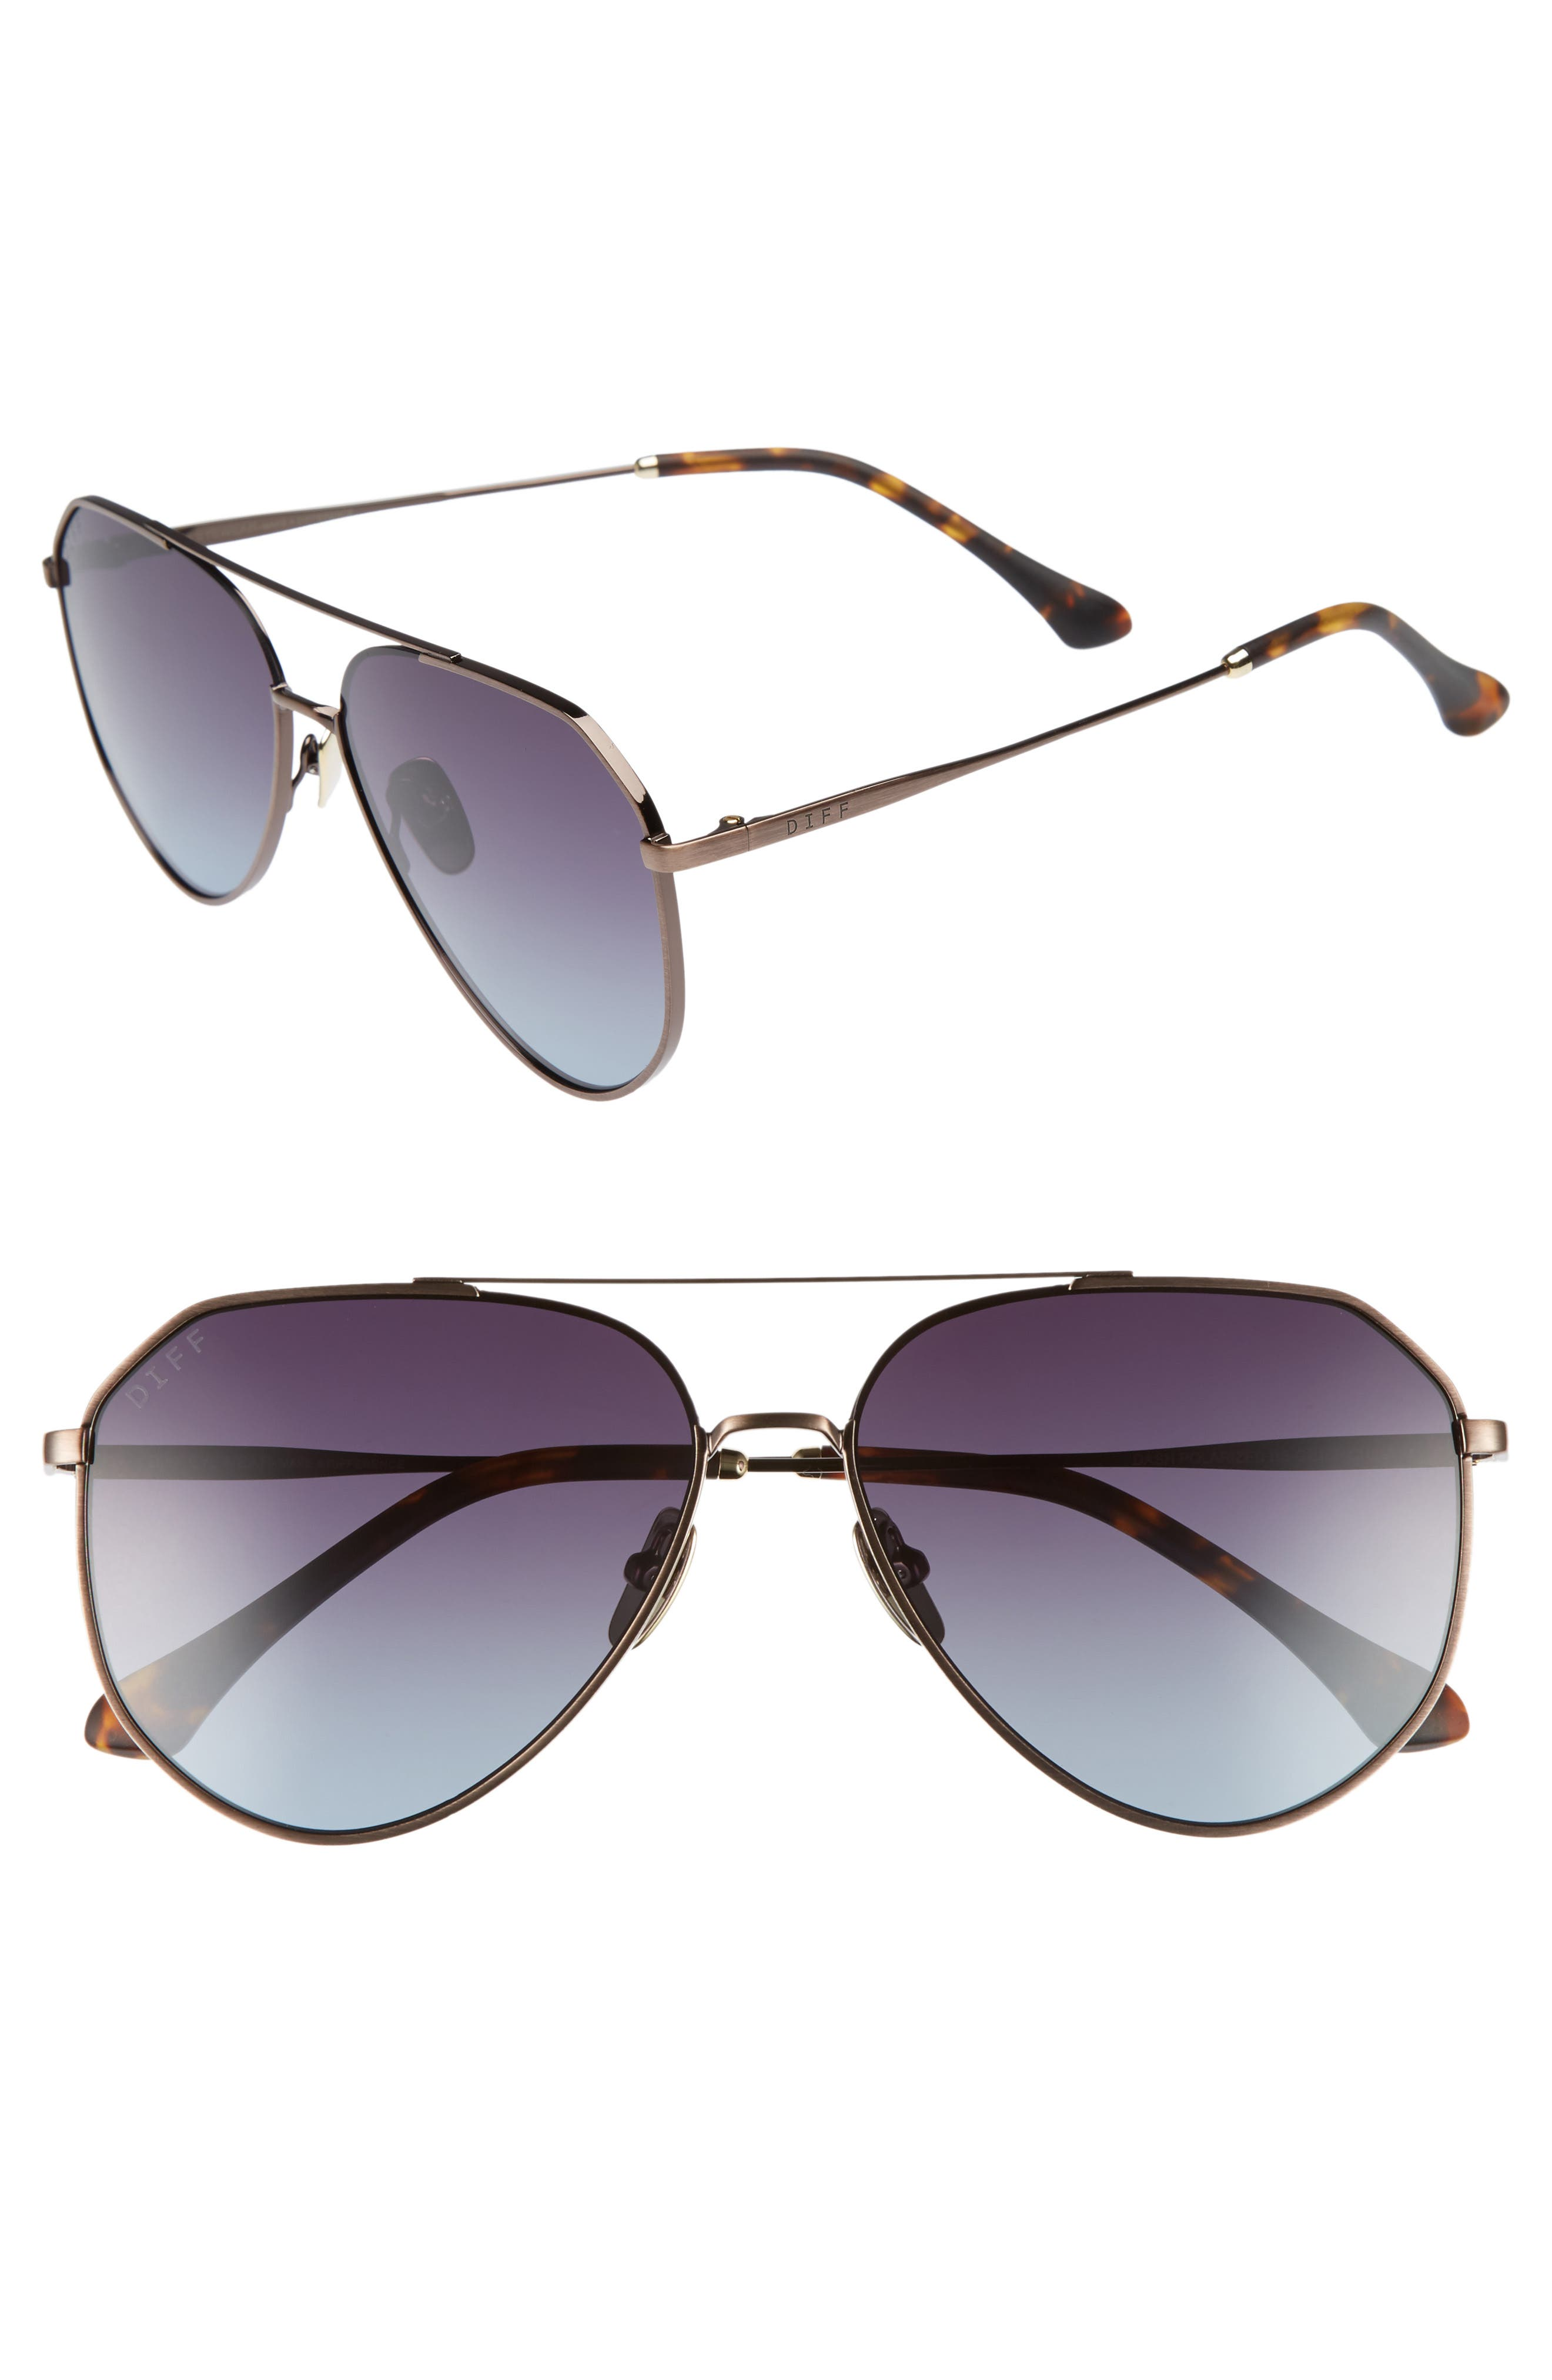 1dcf0f42c3 Fake Oakley Sunglasses Livestrong Bracelet « One More Soul